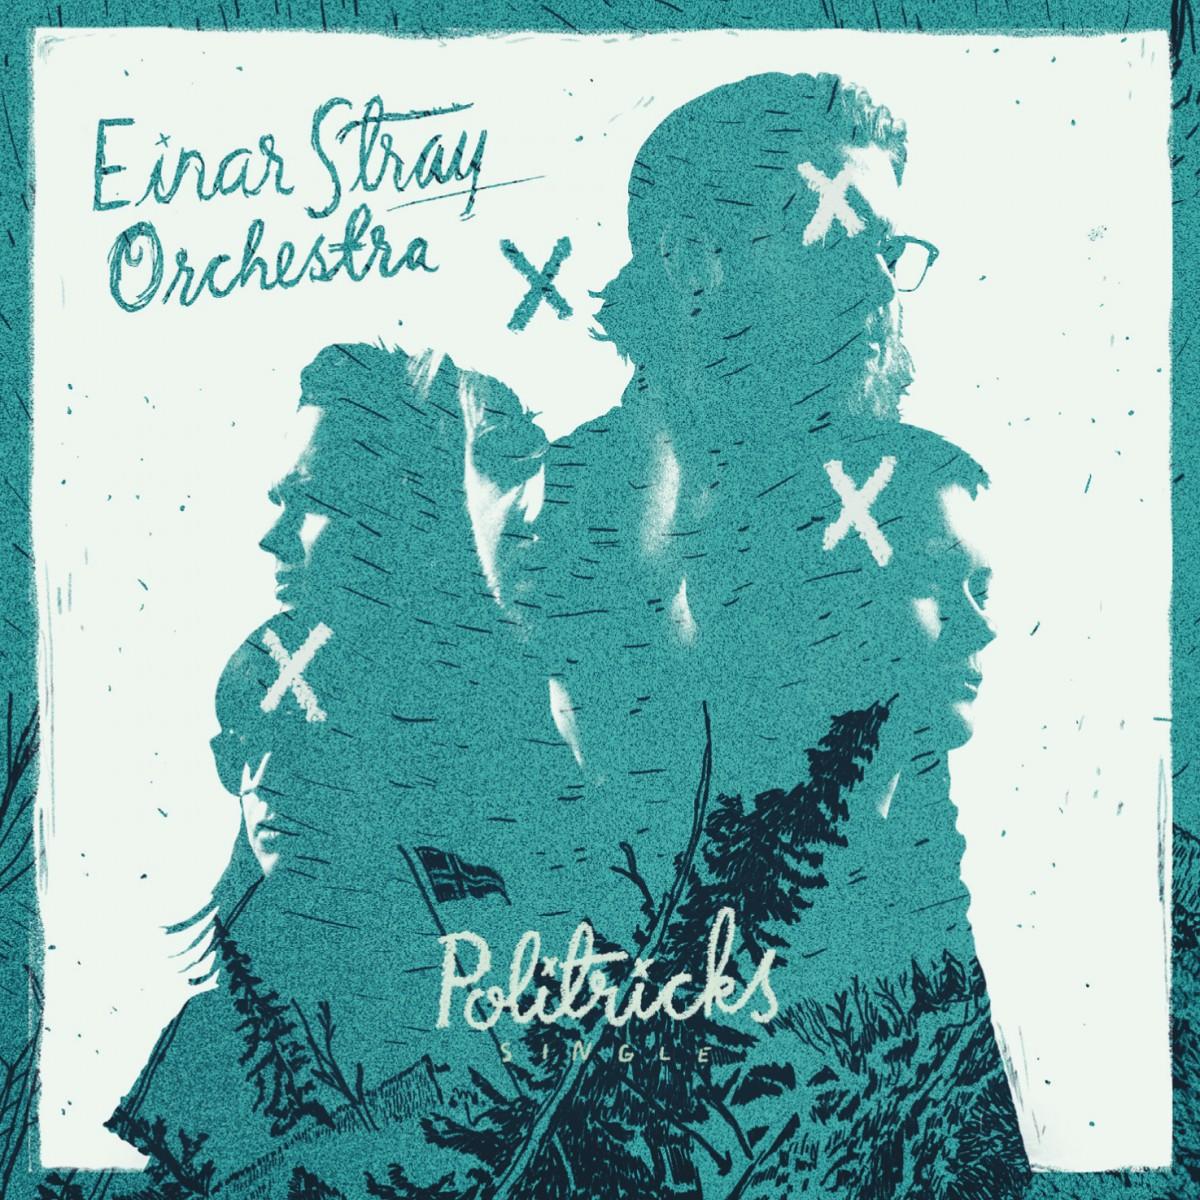 Rezensionen: Einar Stray Orchestra, Zeds Dead, Nothing But Thieves, Charli XCX